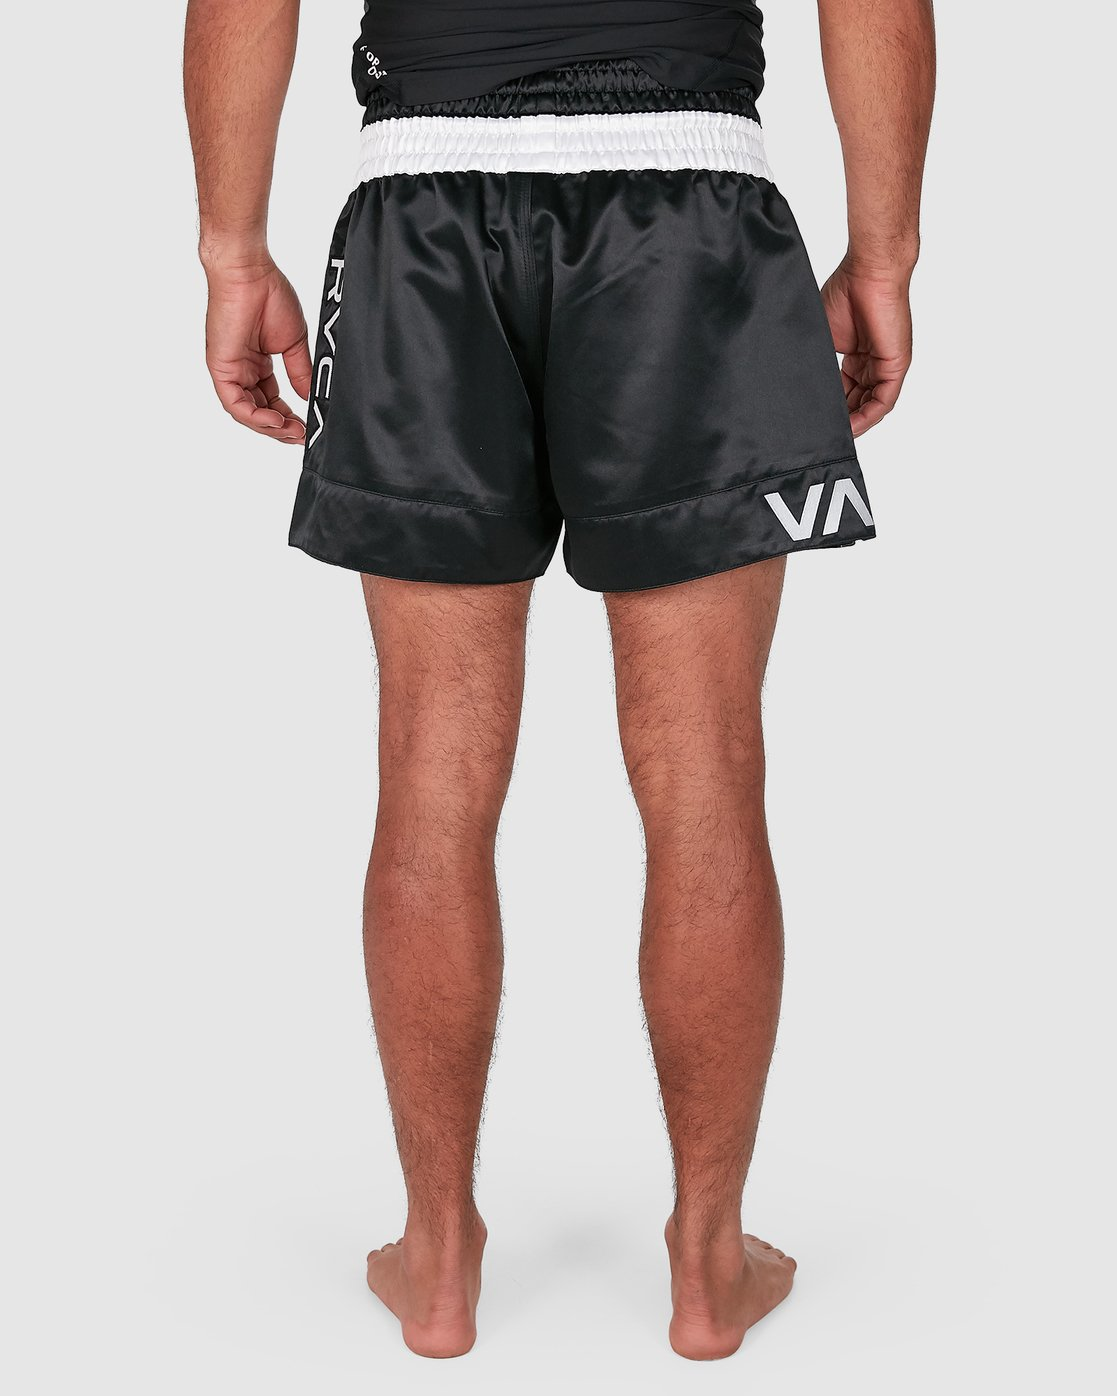 8 RVCA MUAY THAI SHORTS Black R307312 RVCA